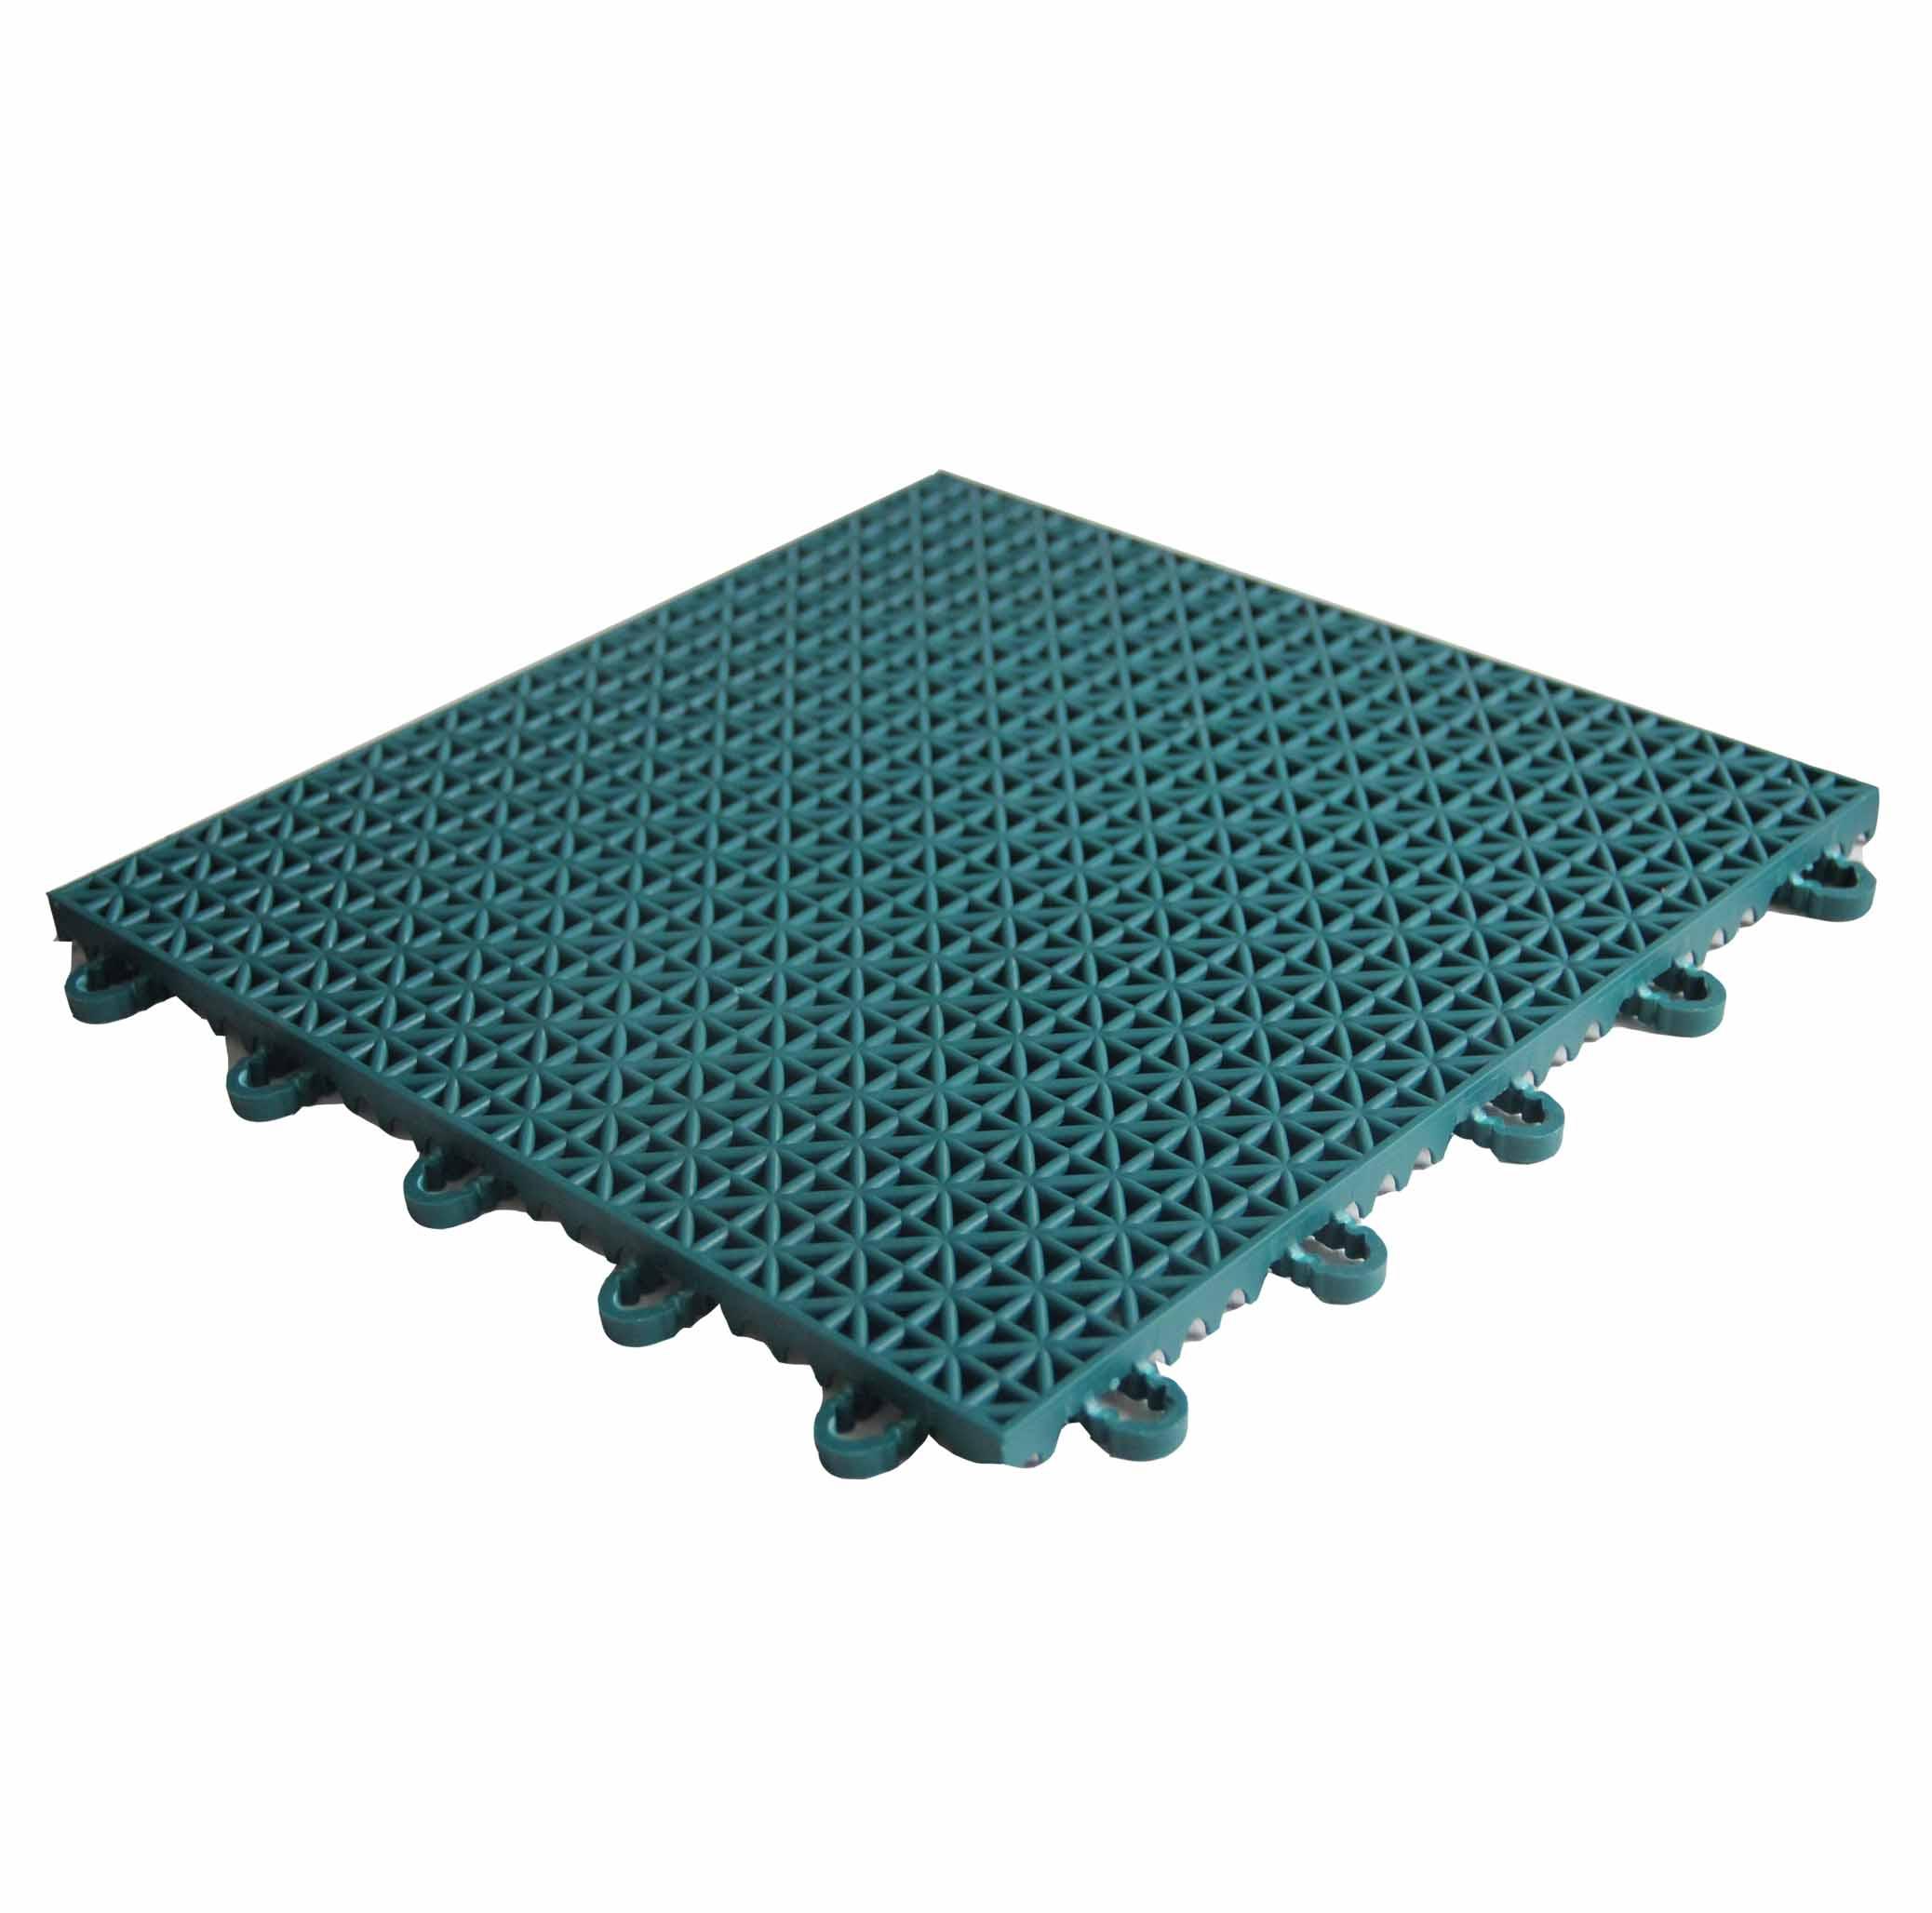 Adjustable buckle mizi grid